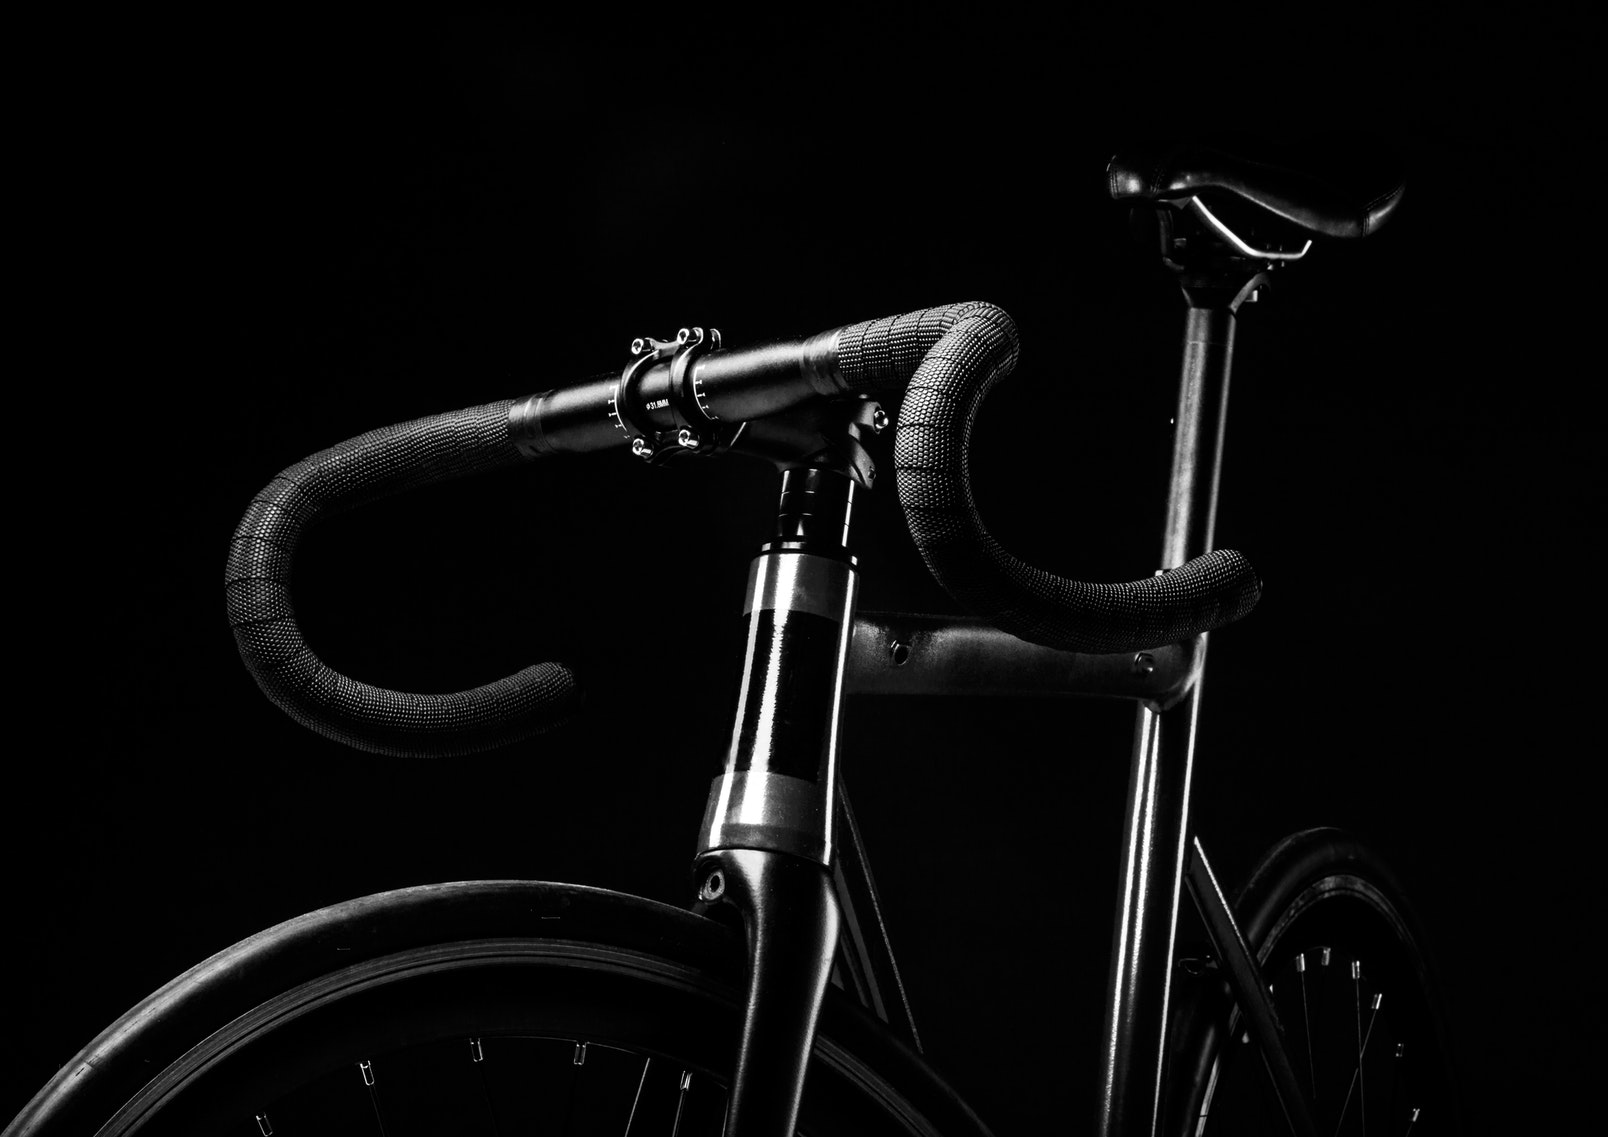 Same black bike, much different impressions.